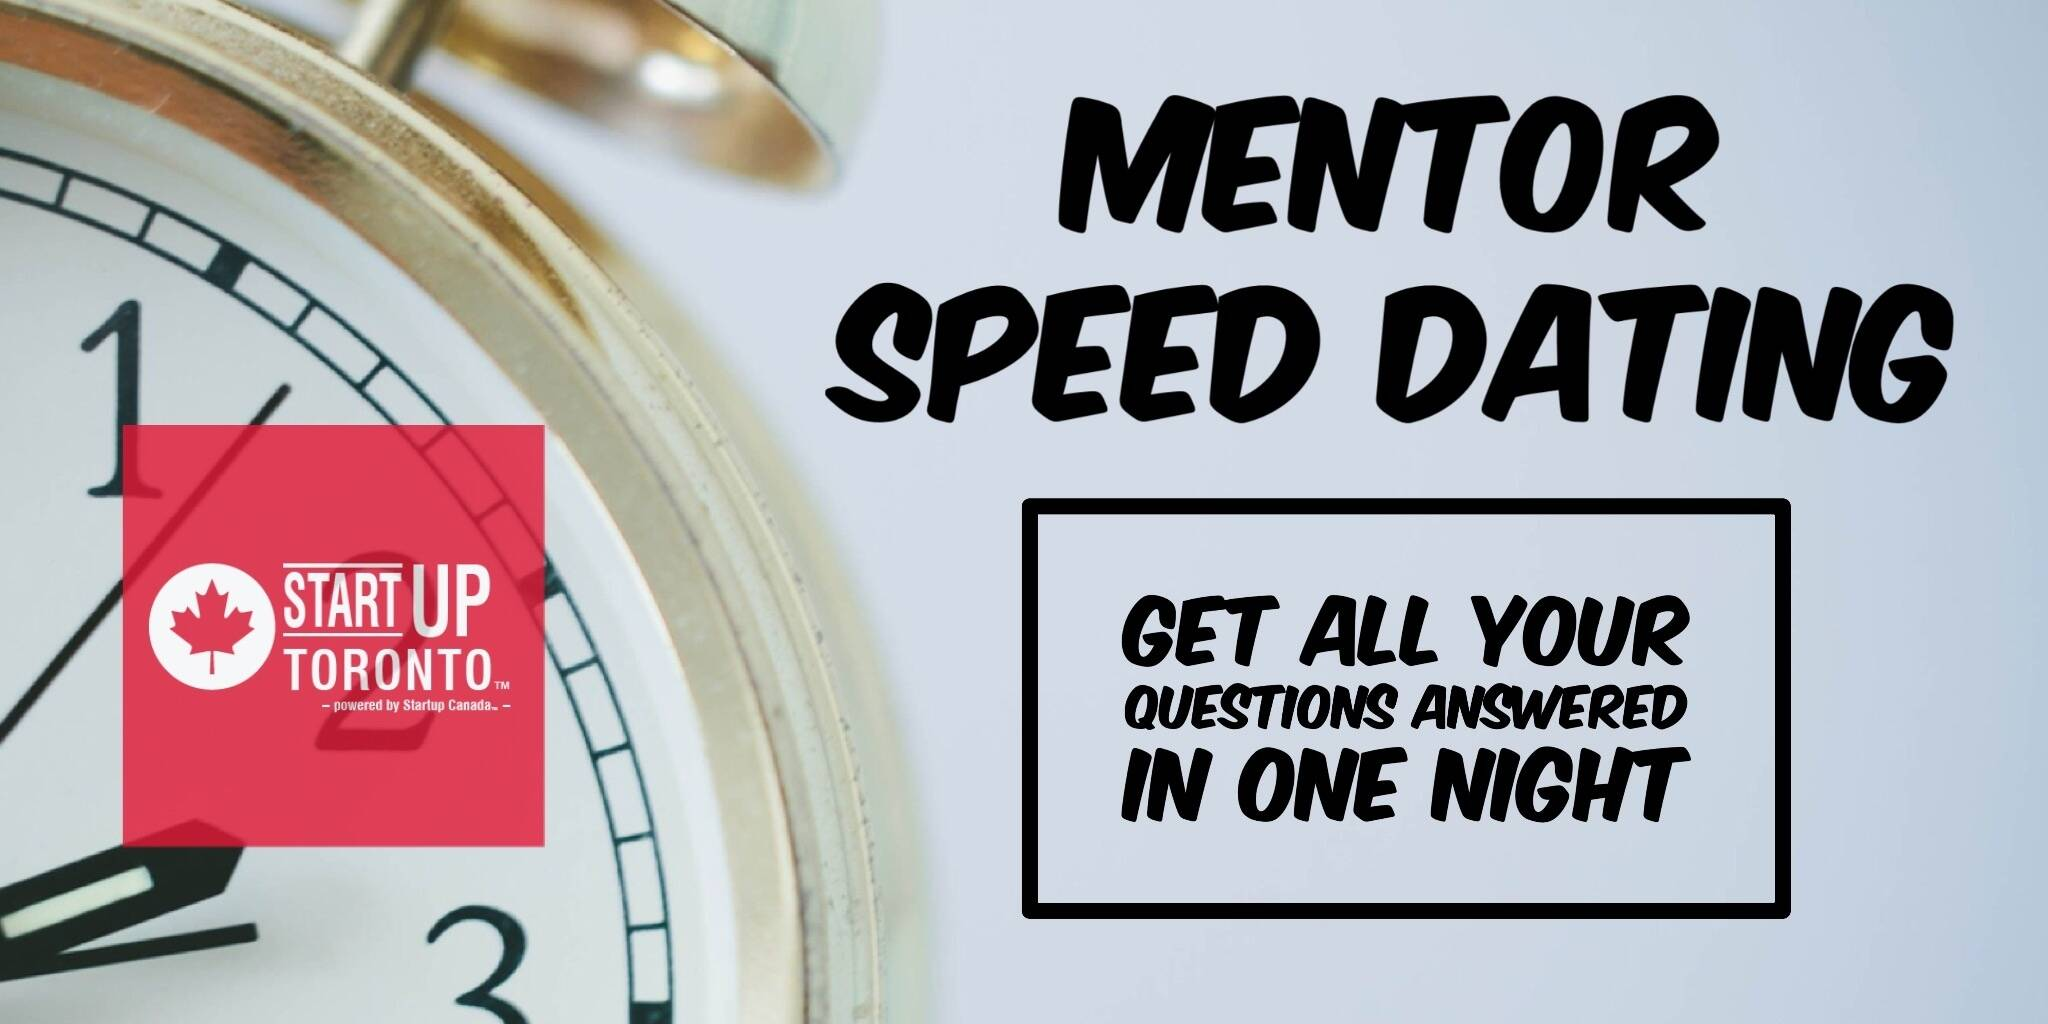 speed dating mentorship chonda pierce online dating